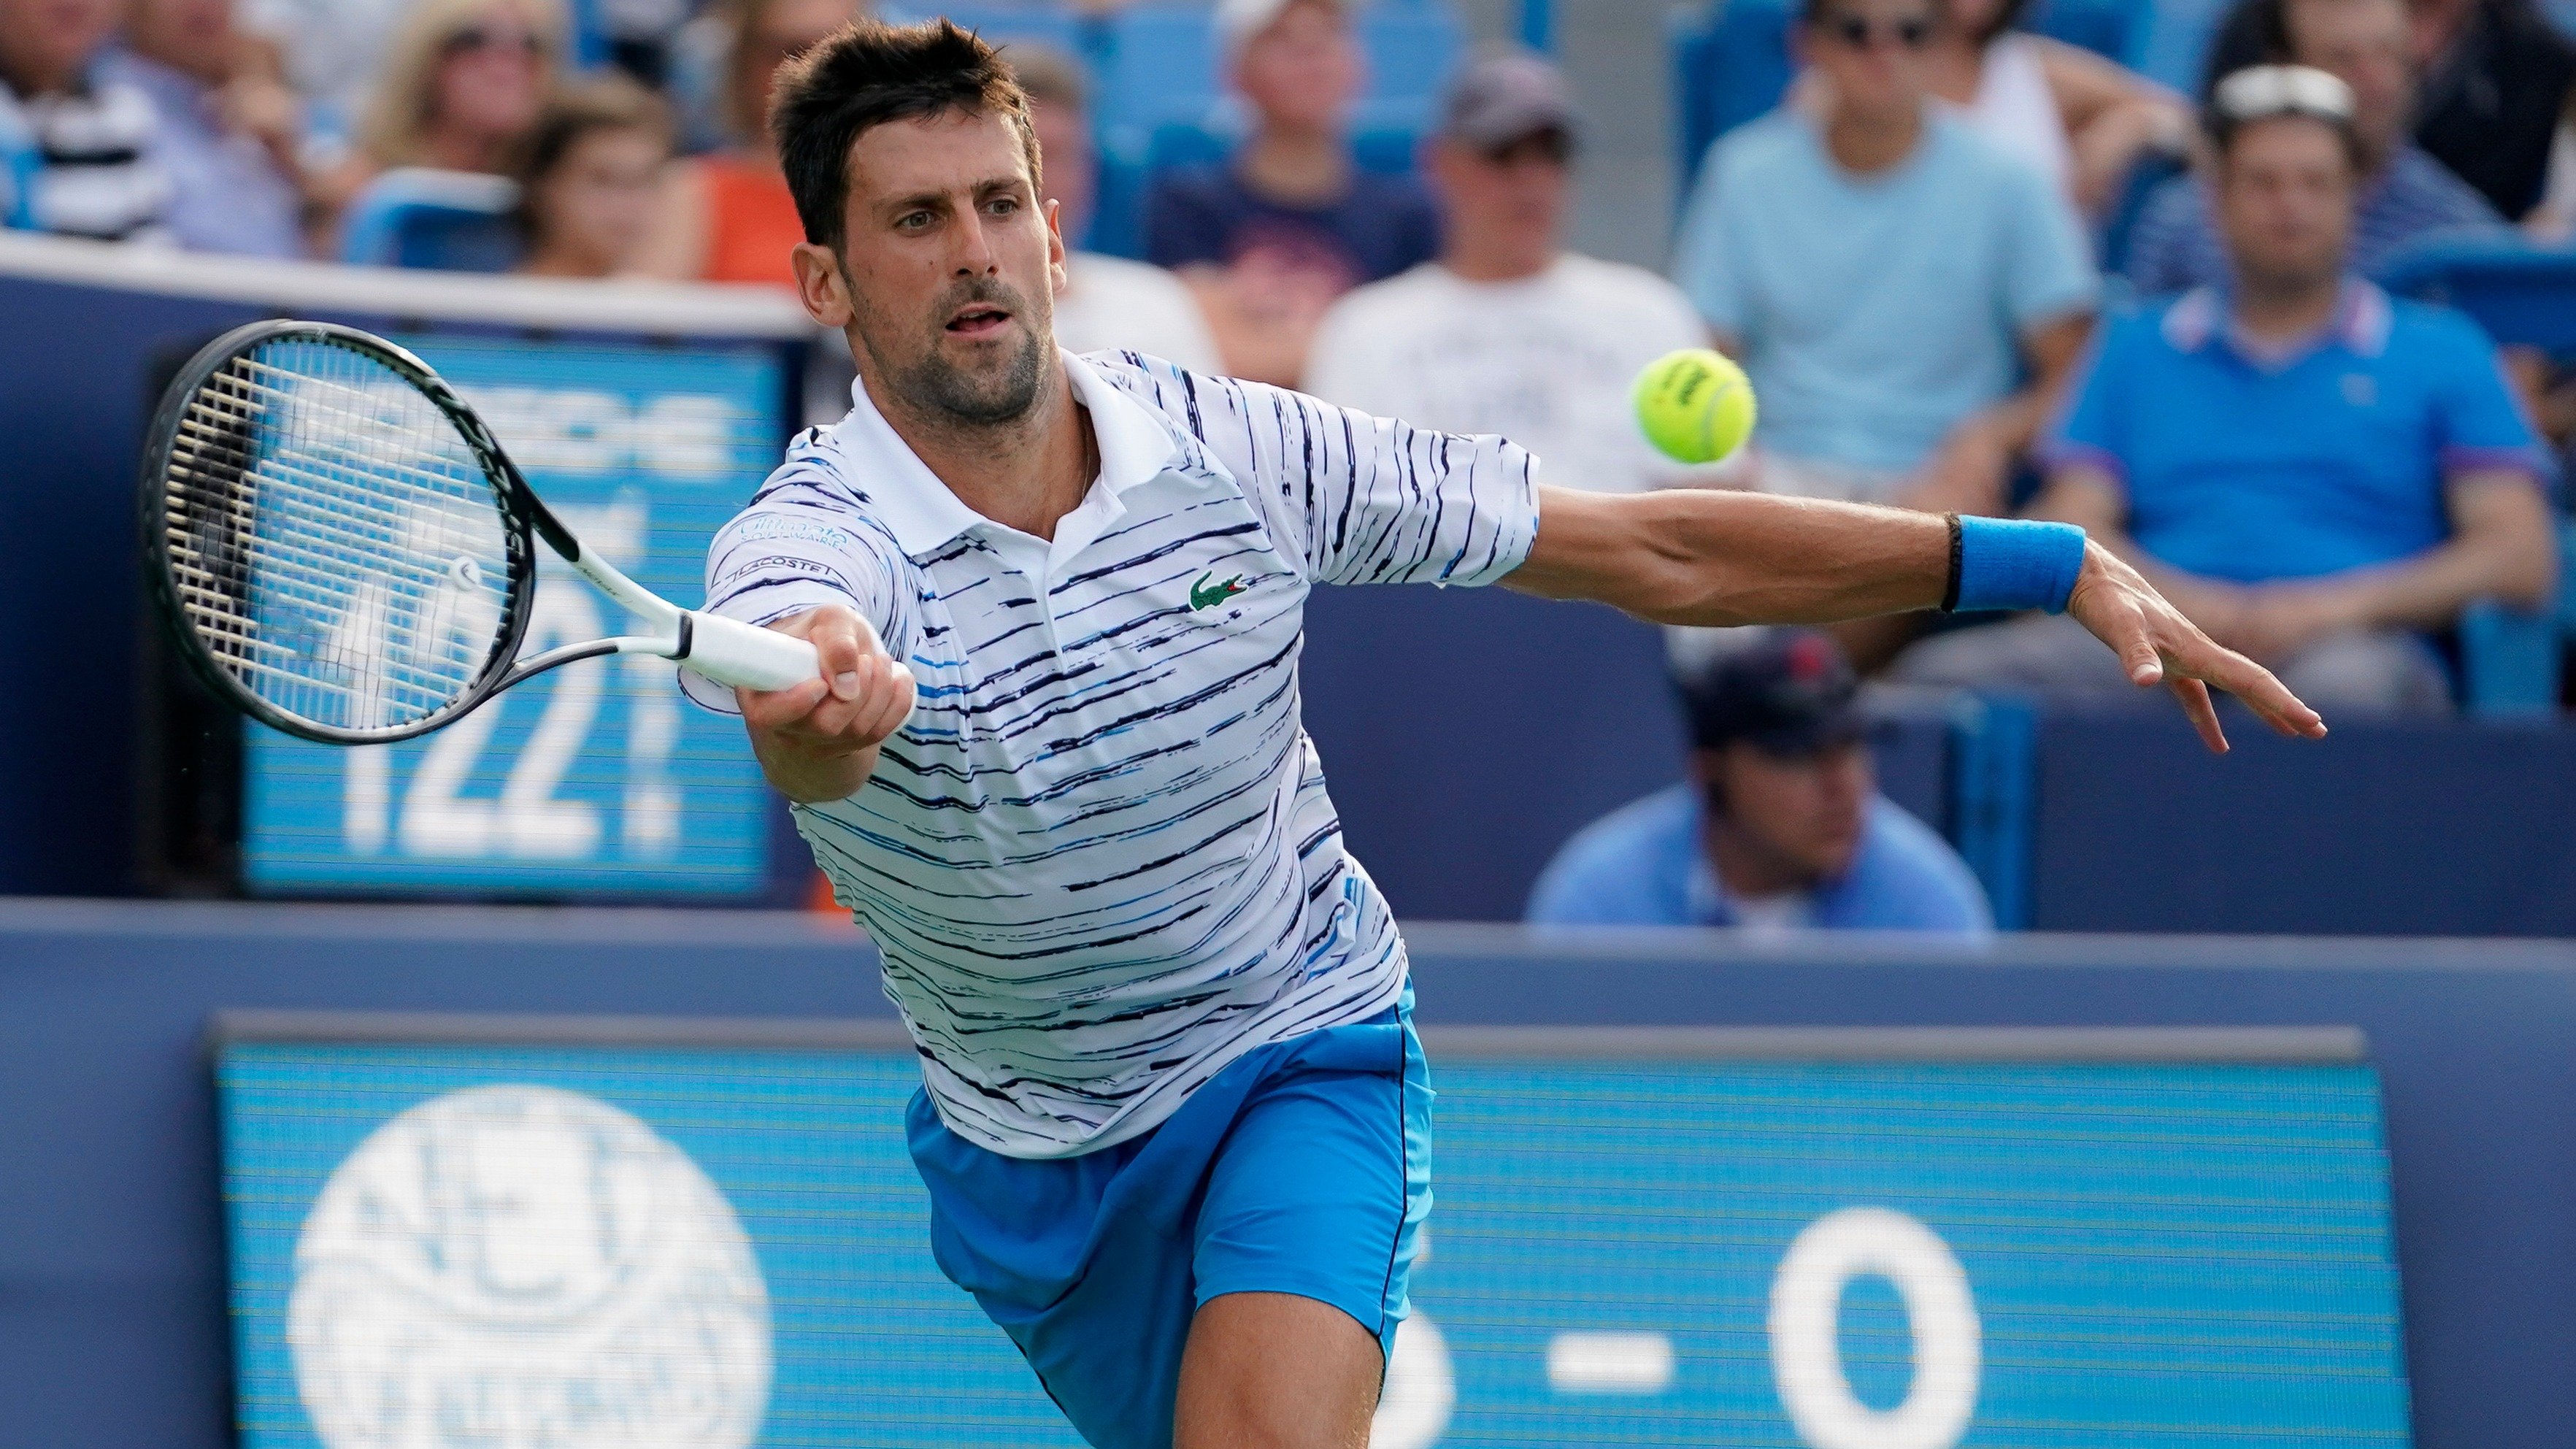 2019 U S Open Men S Tennis Odds Who Can Challenge The Big Three